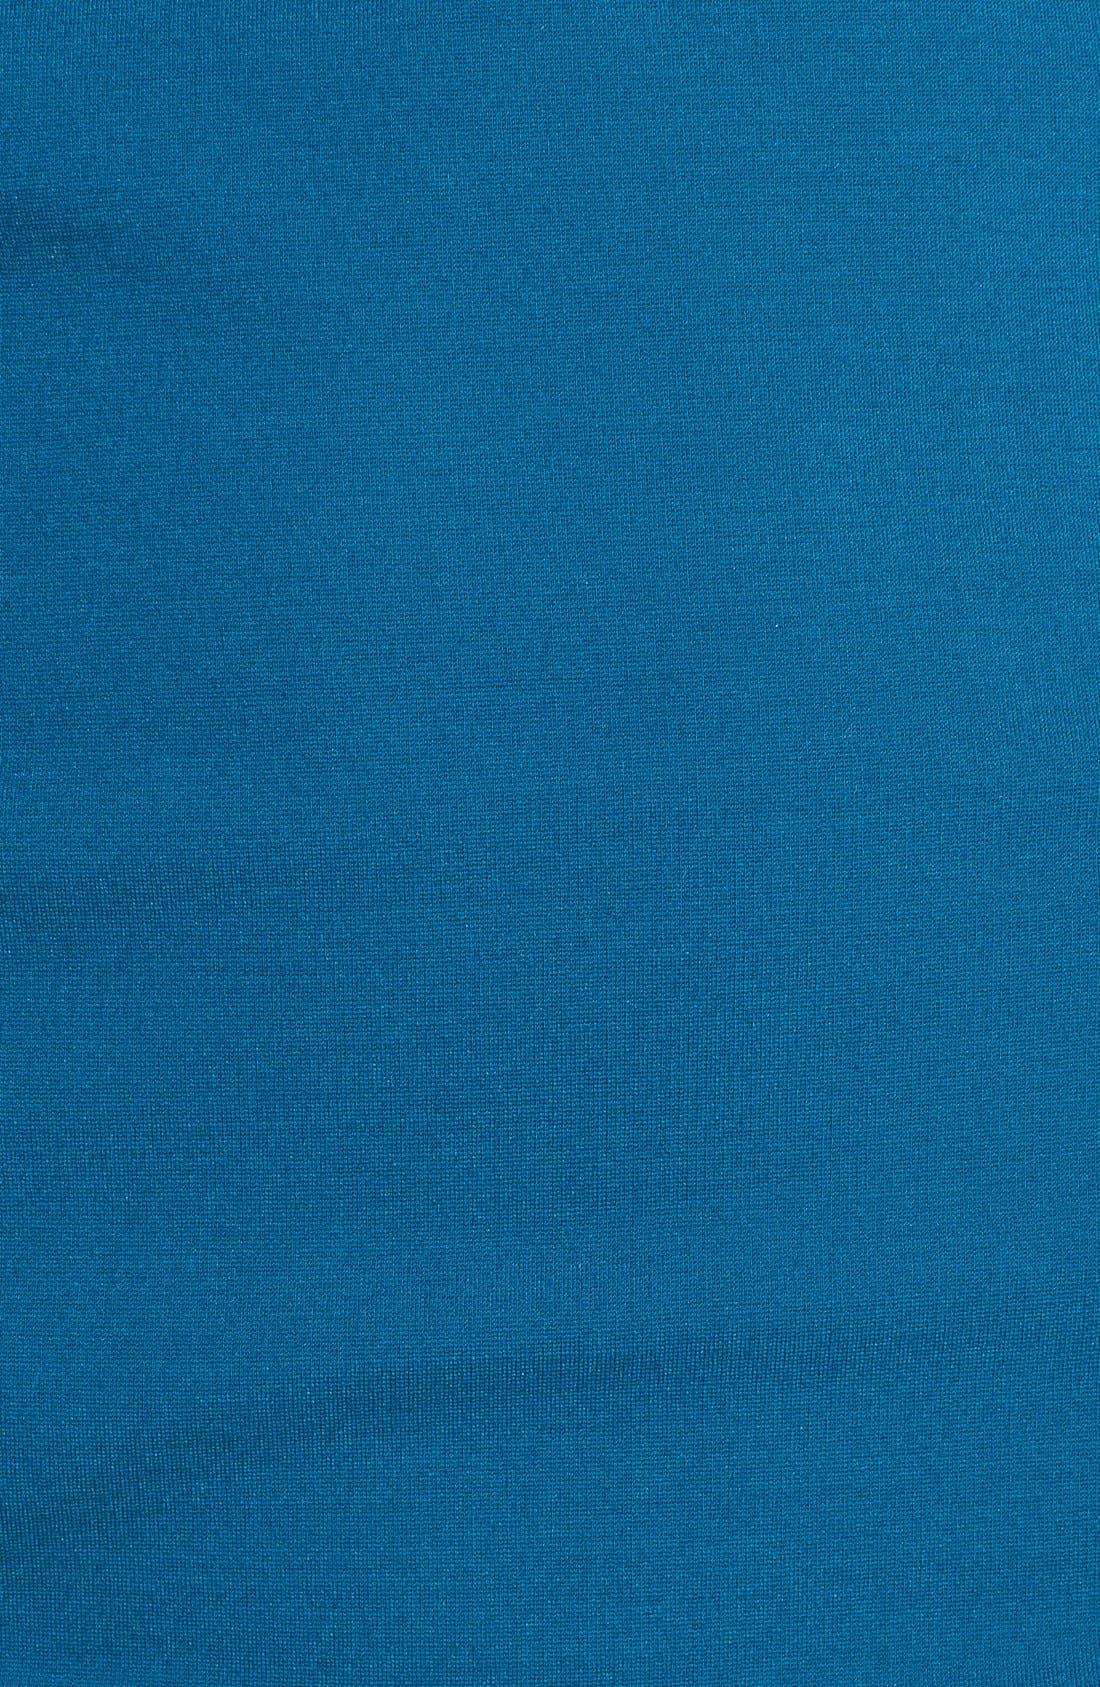 Alternate Image 3  - DKNYC Colorblock Faux Leather Trim Dress